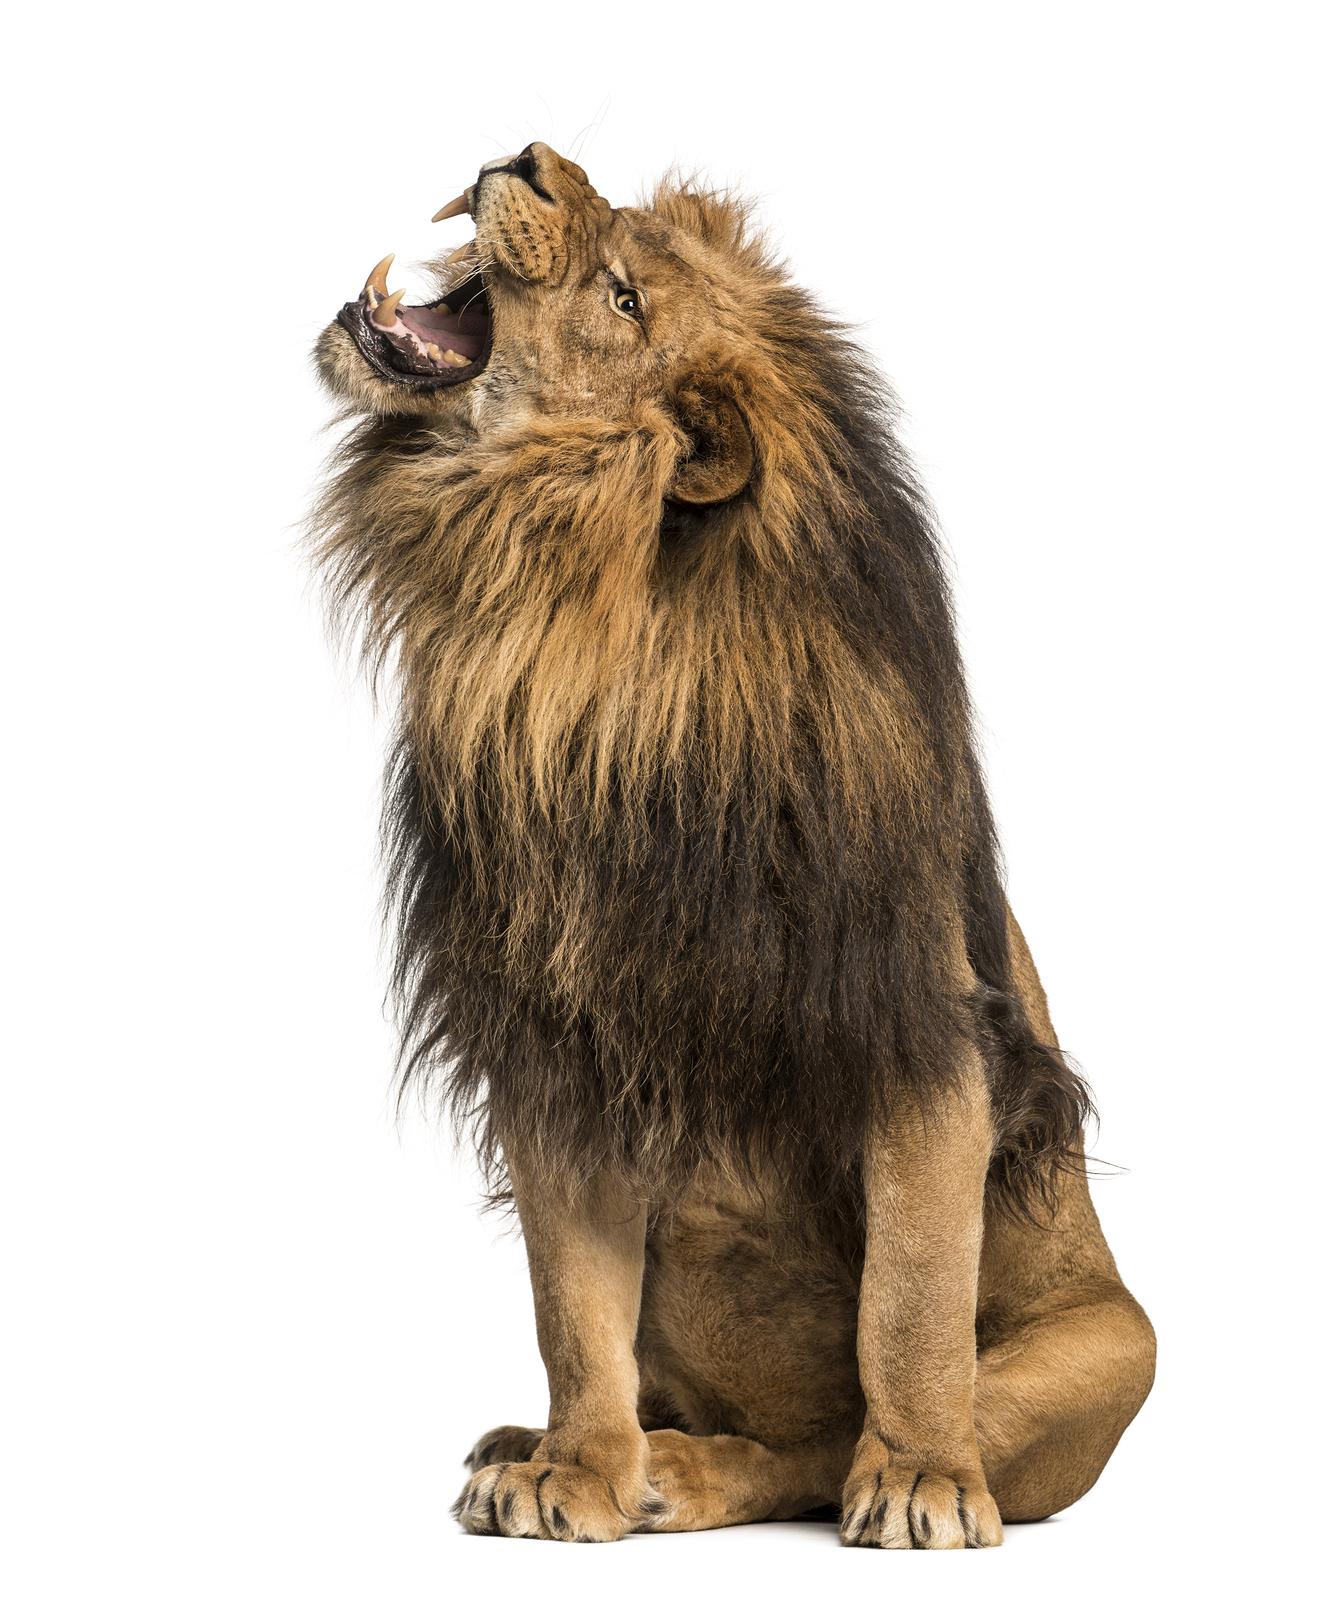 Lion roaring, sitting, Panthera Leo, 10 years old, isolated on white